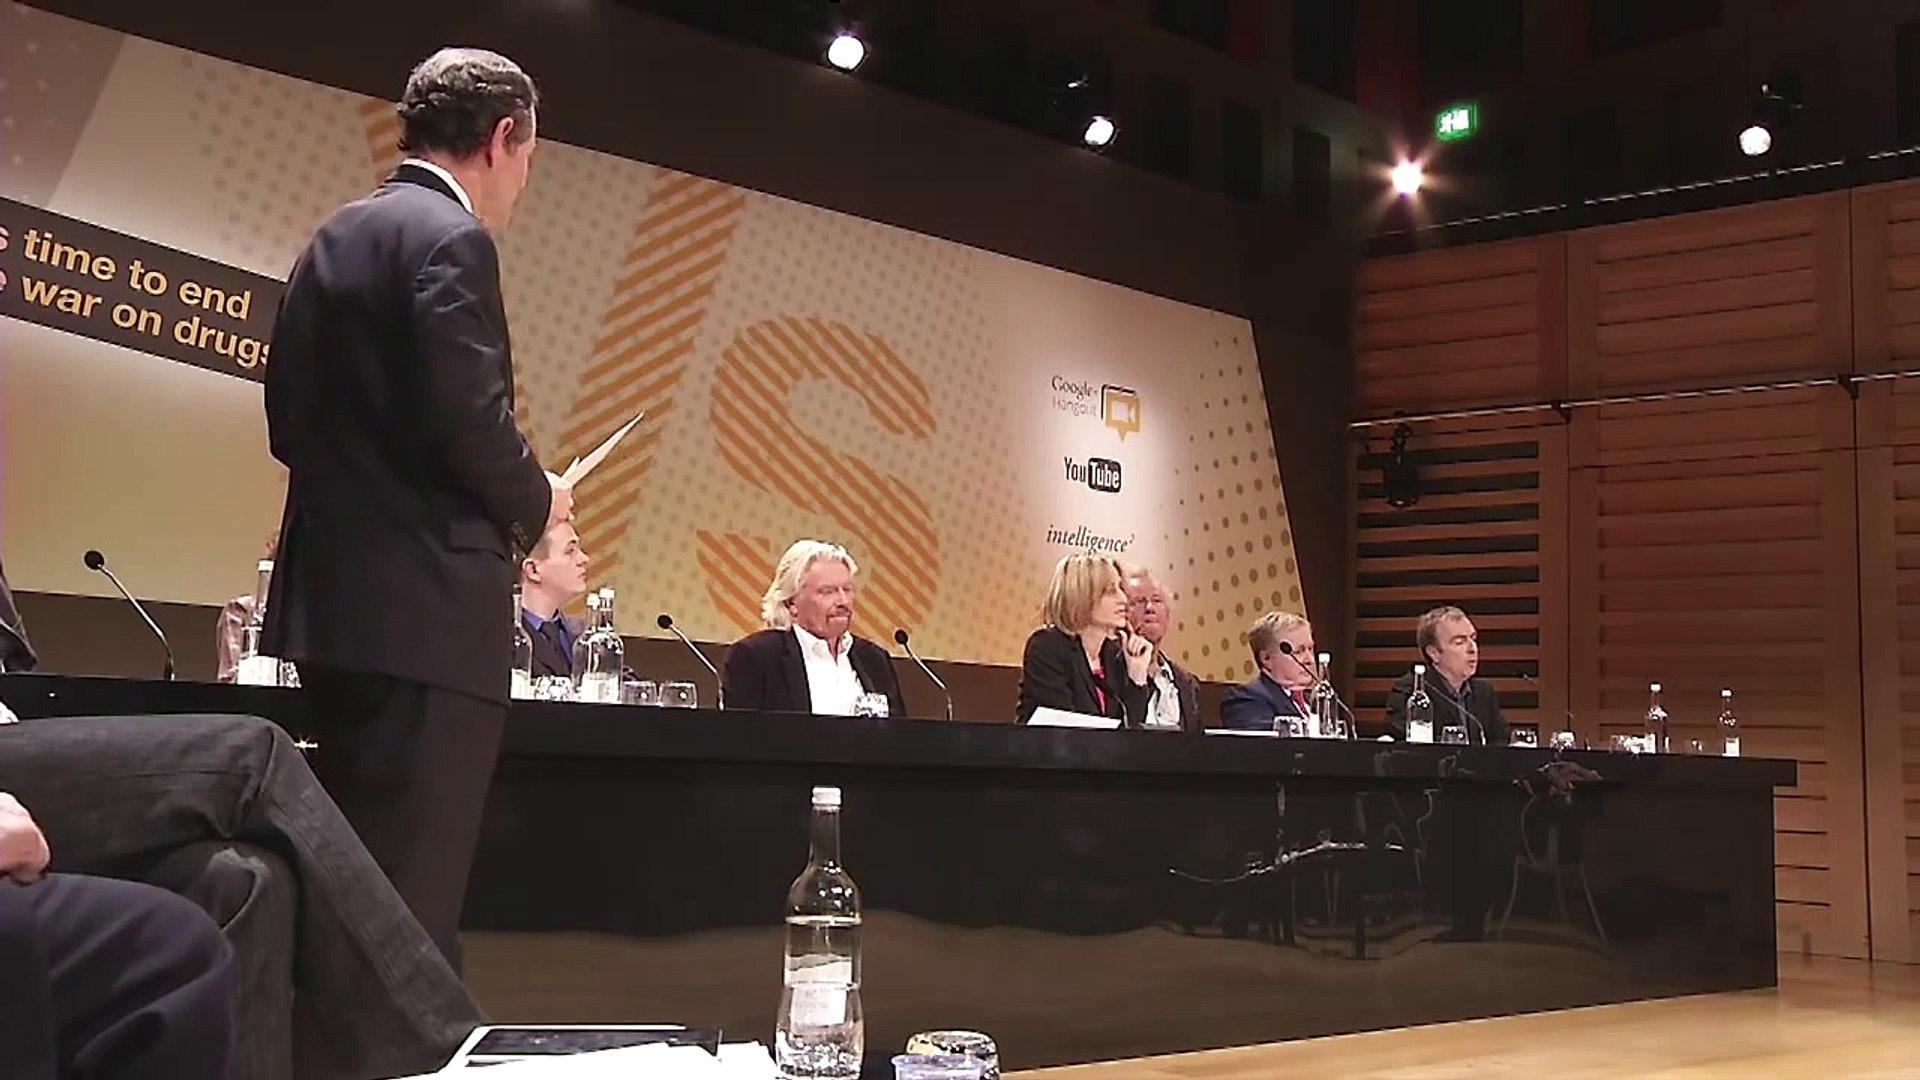 War on Drugs - Peter Hitchens' moral argument against drugs. Versus debate extract.